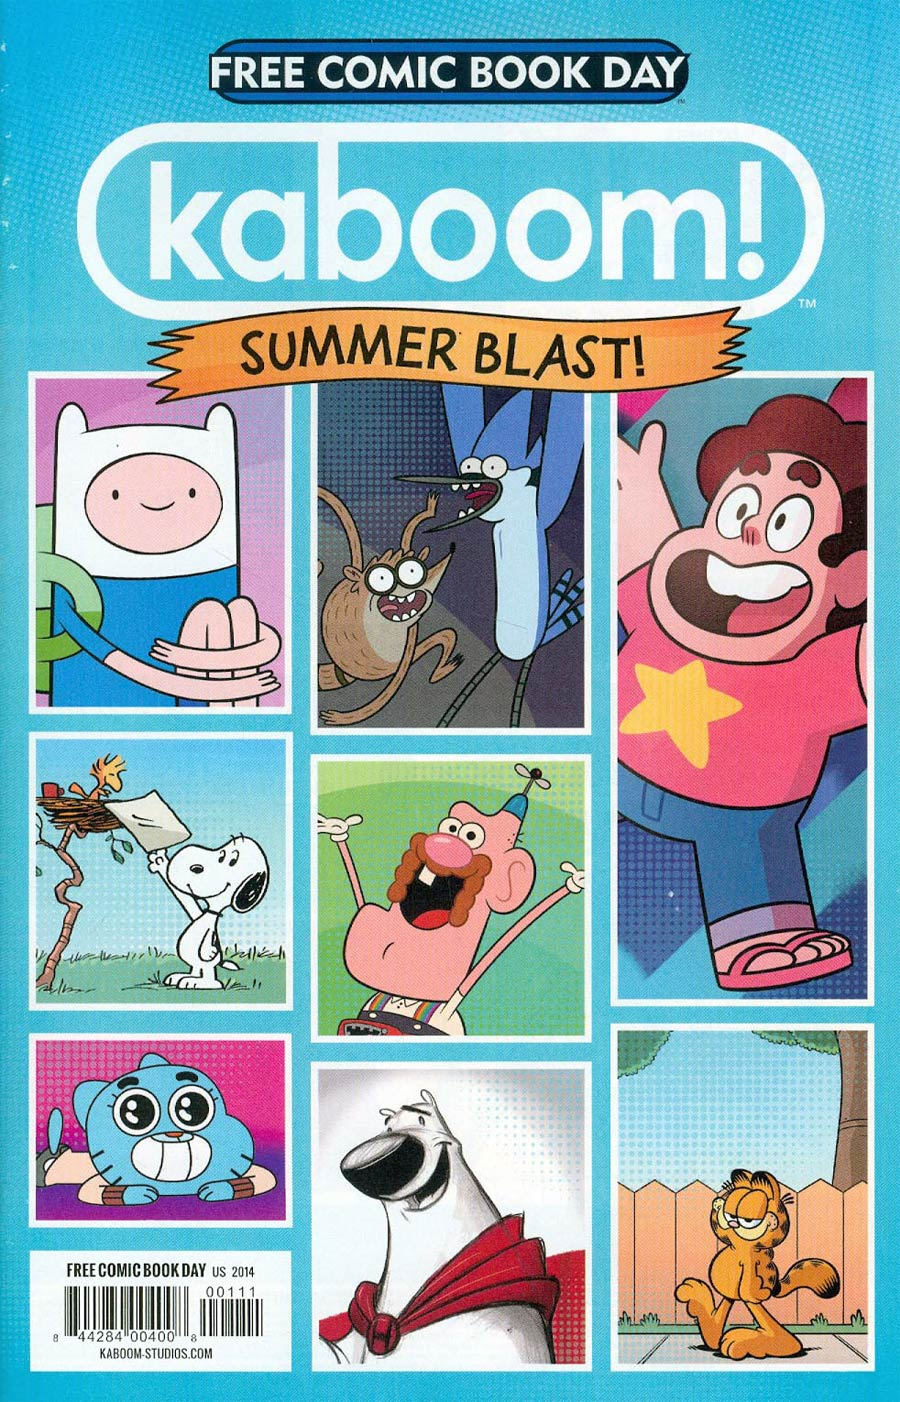 FCBD 2014 KaBOOM Summer Blast